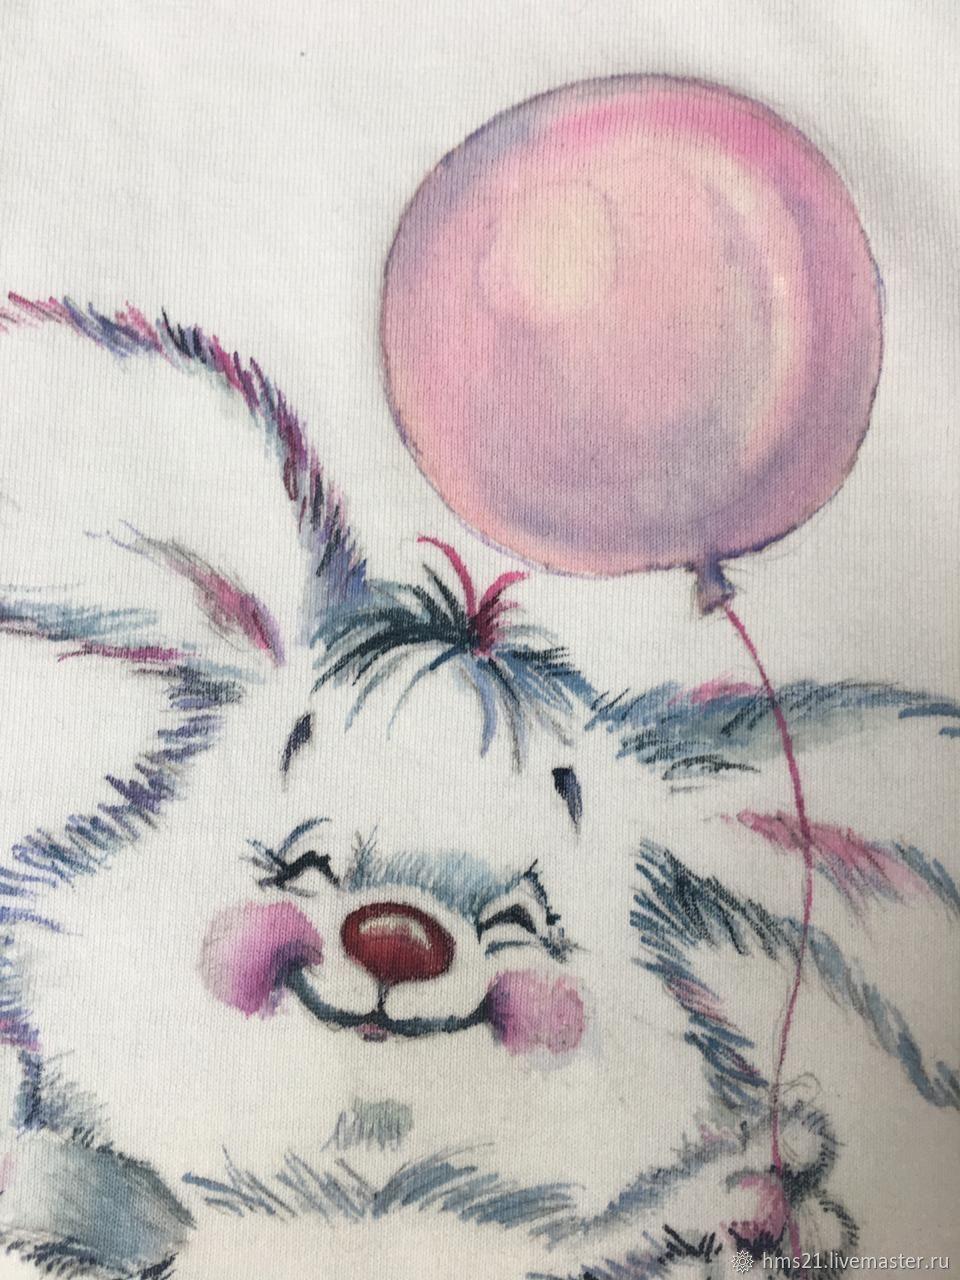 Майка, ручная роспись красками по ткани